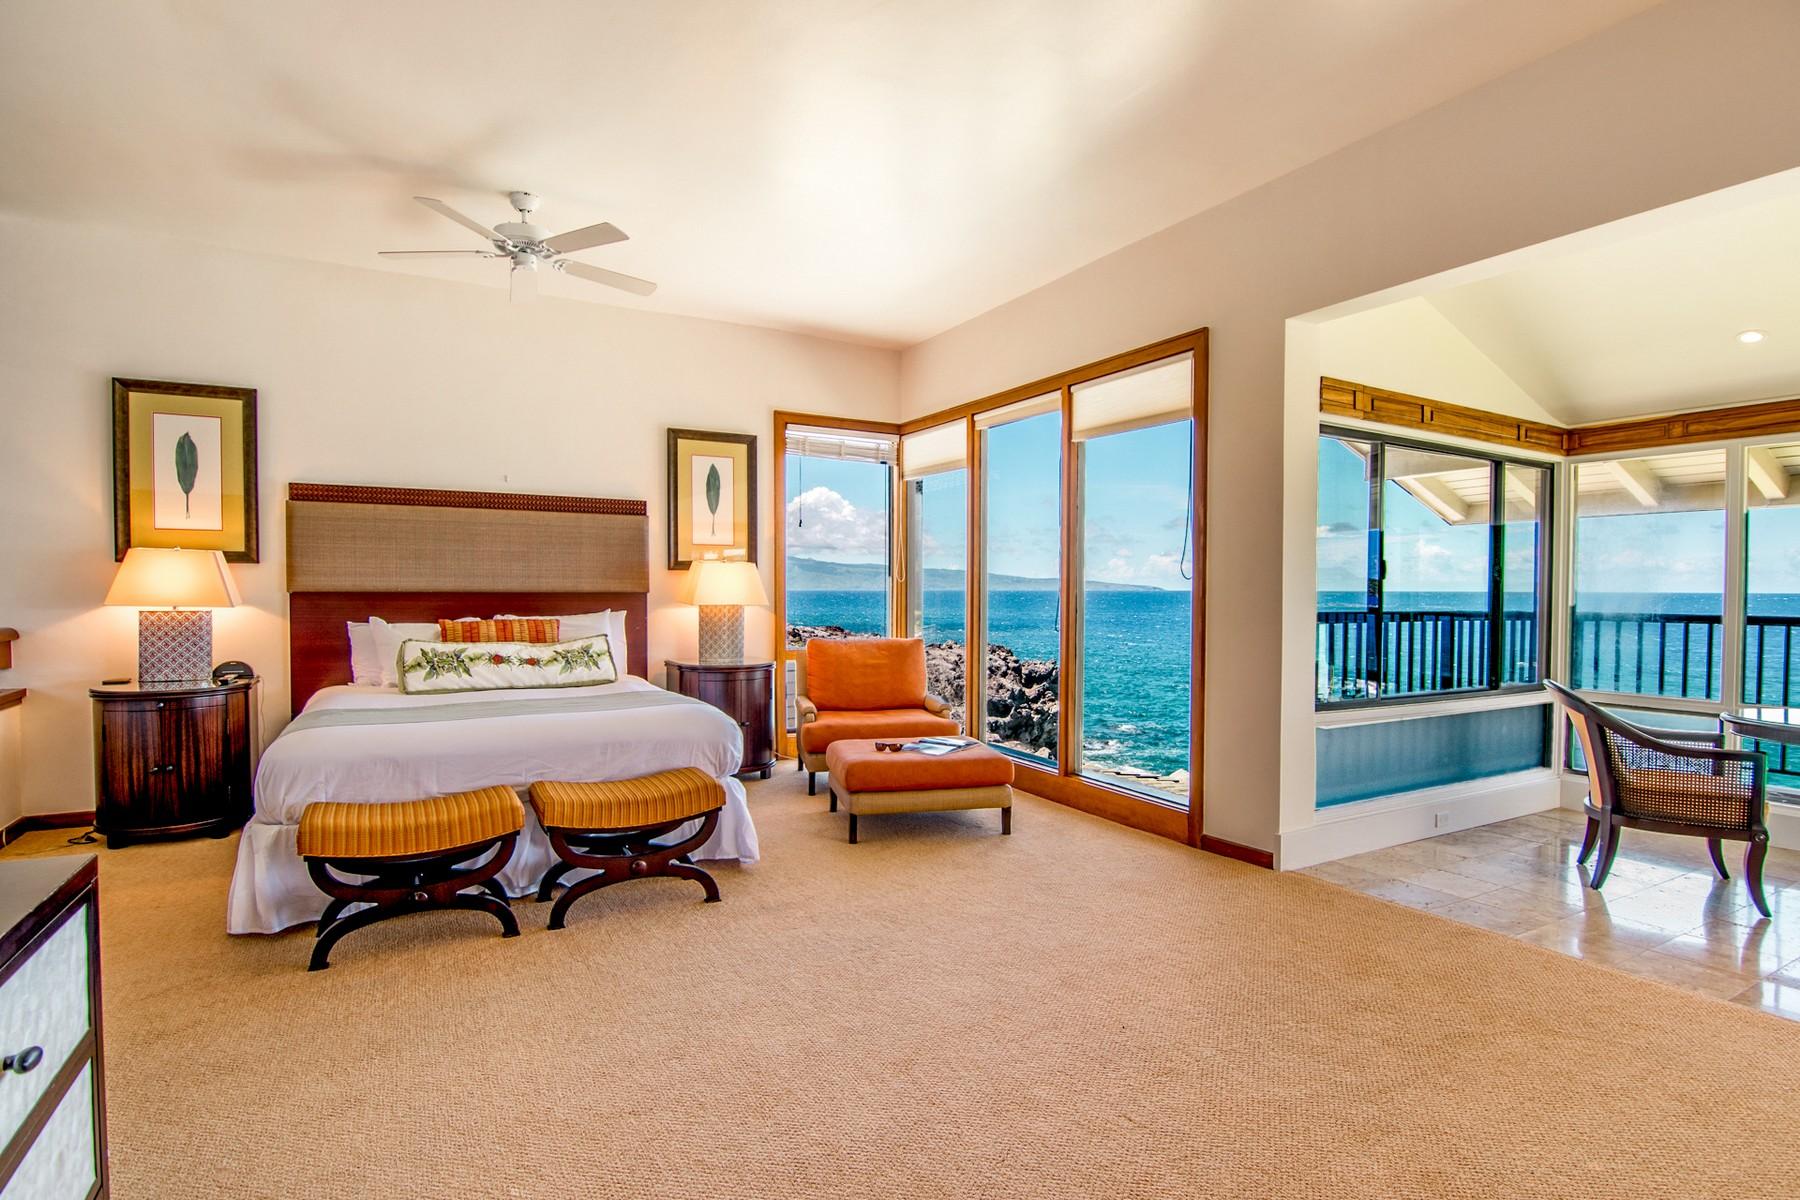 Condominium for Sale at Kapalua Bay Villa Oceanfront Two Bedroom 500 Bay Drive, Kapalua Bay Villa 30B3, 4 Kapalua, Hawaii, 96761 United States